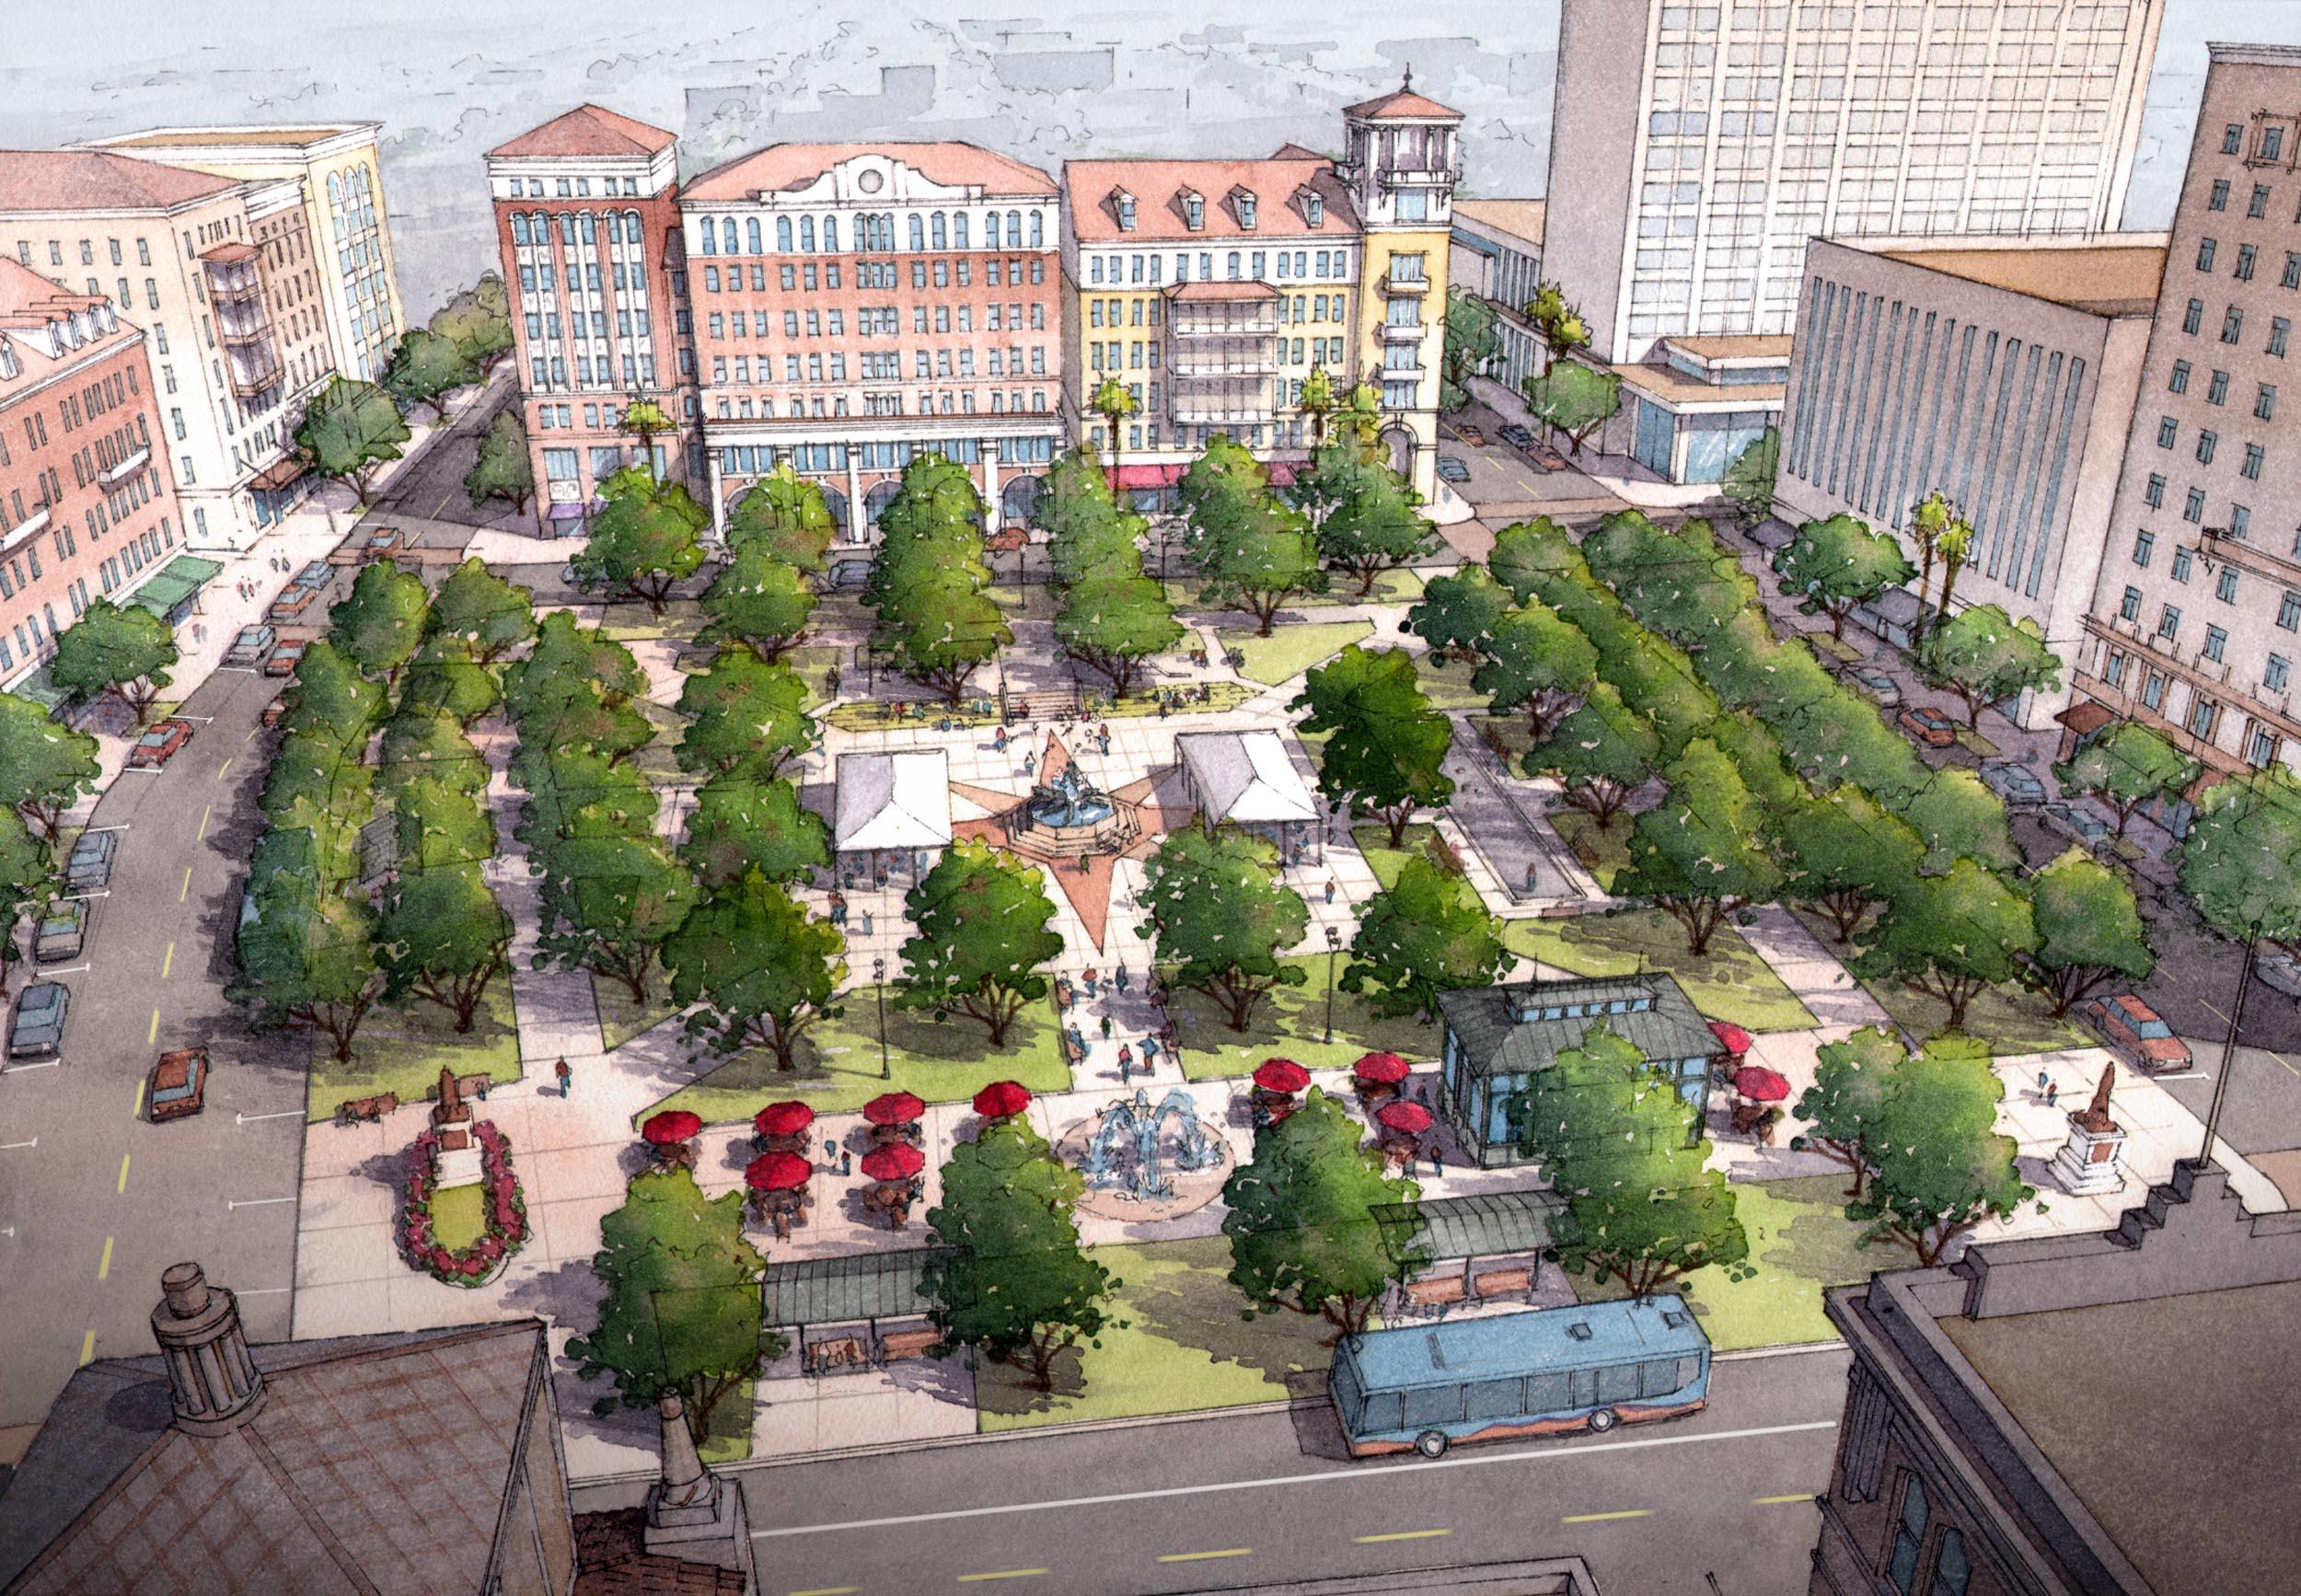 San Jacinto Plaza - DKP design.jpg